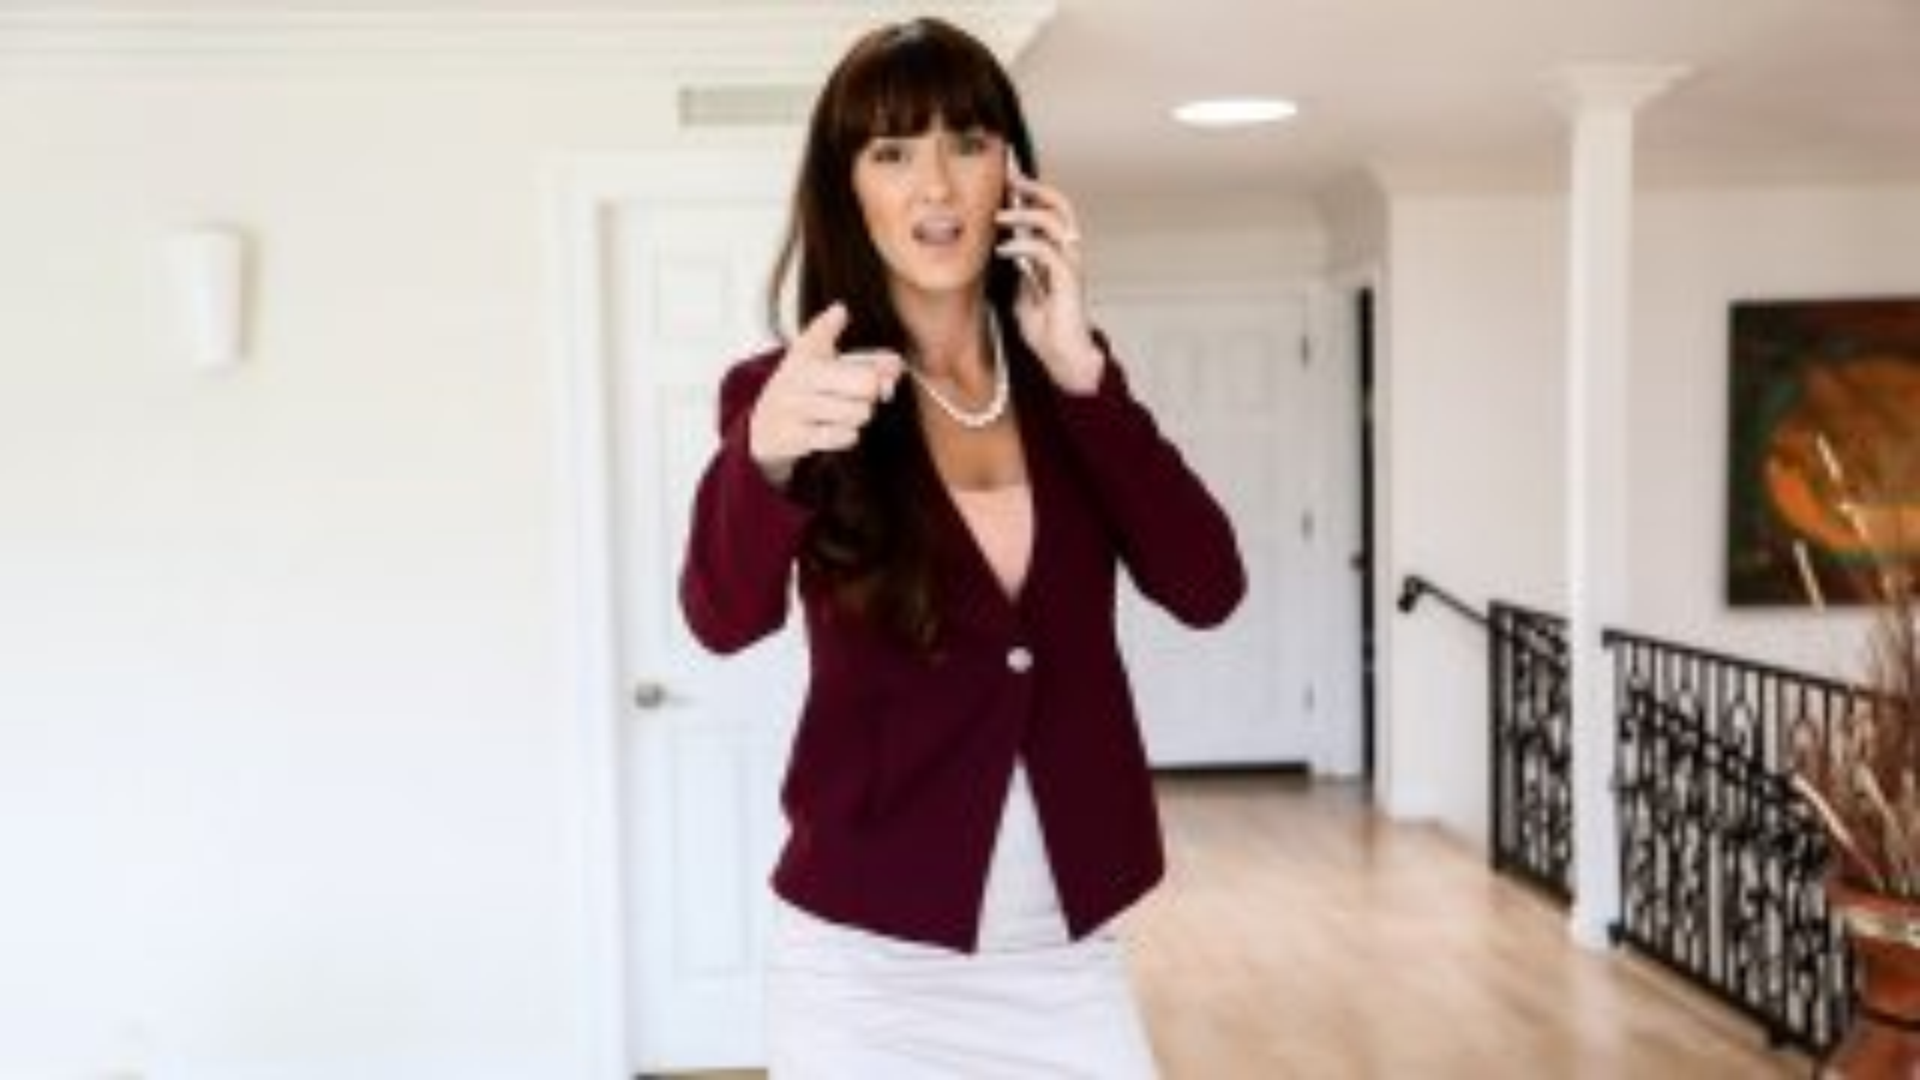 Calling My Fiance - Property Sex